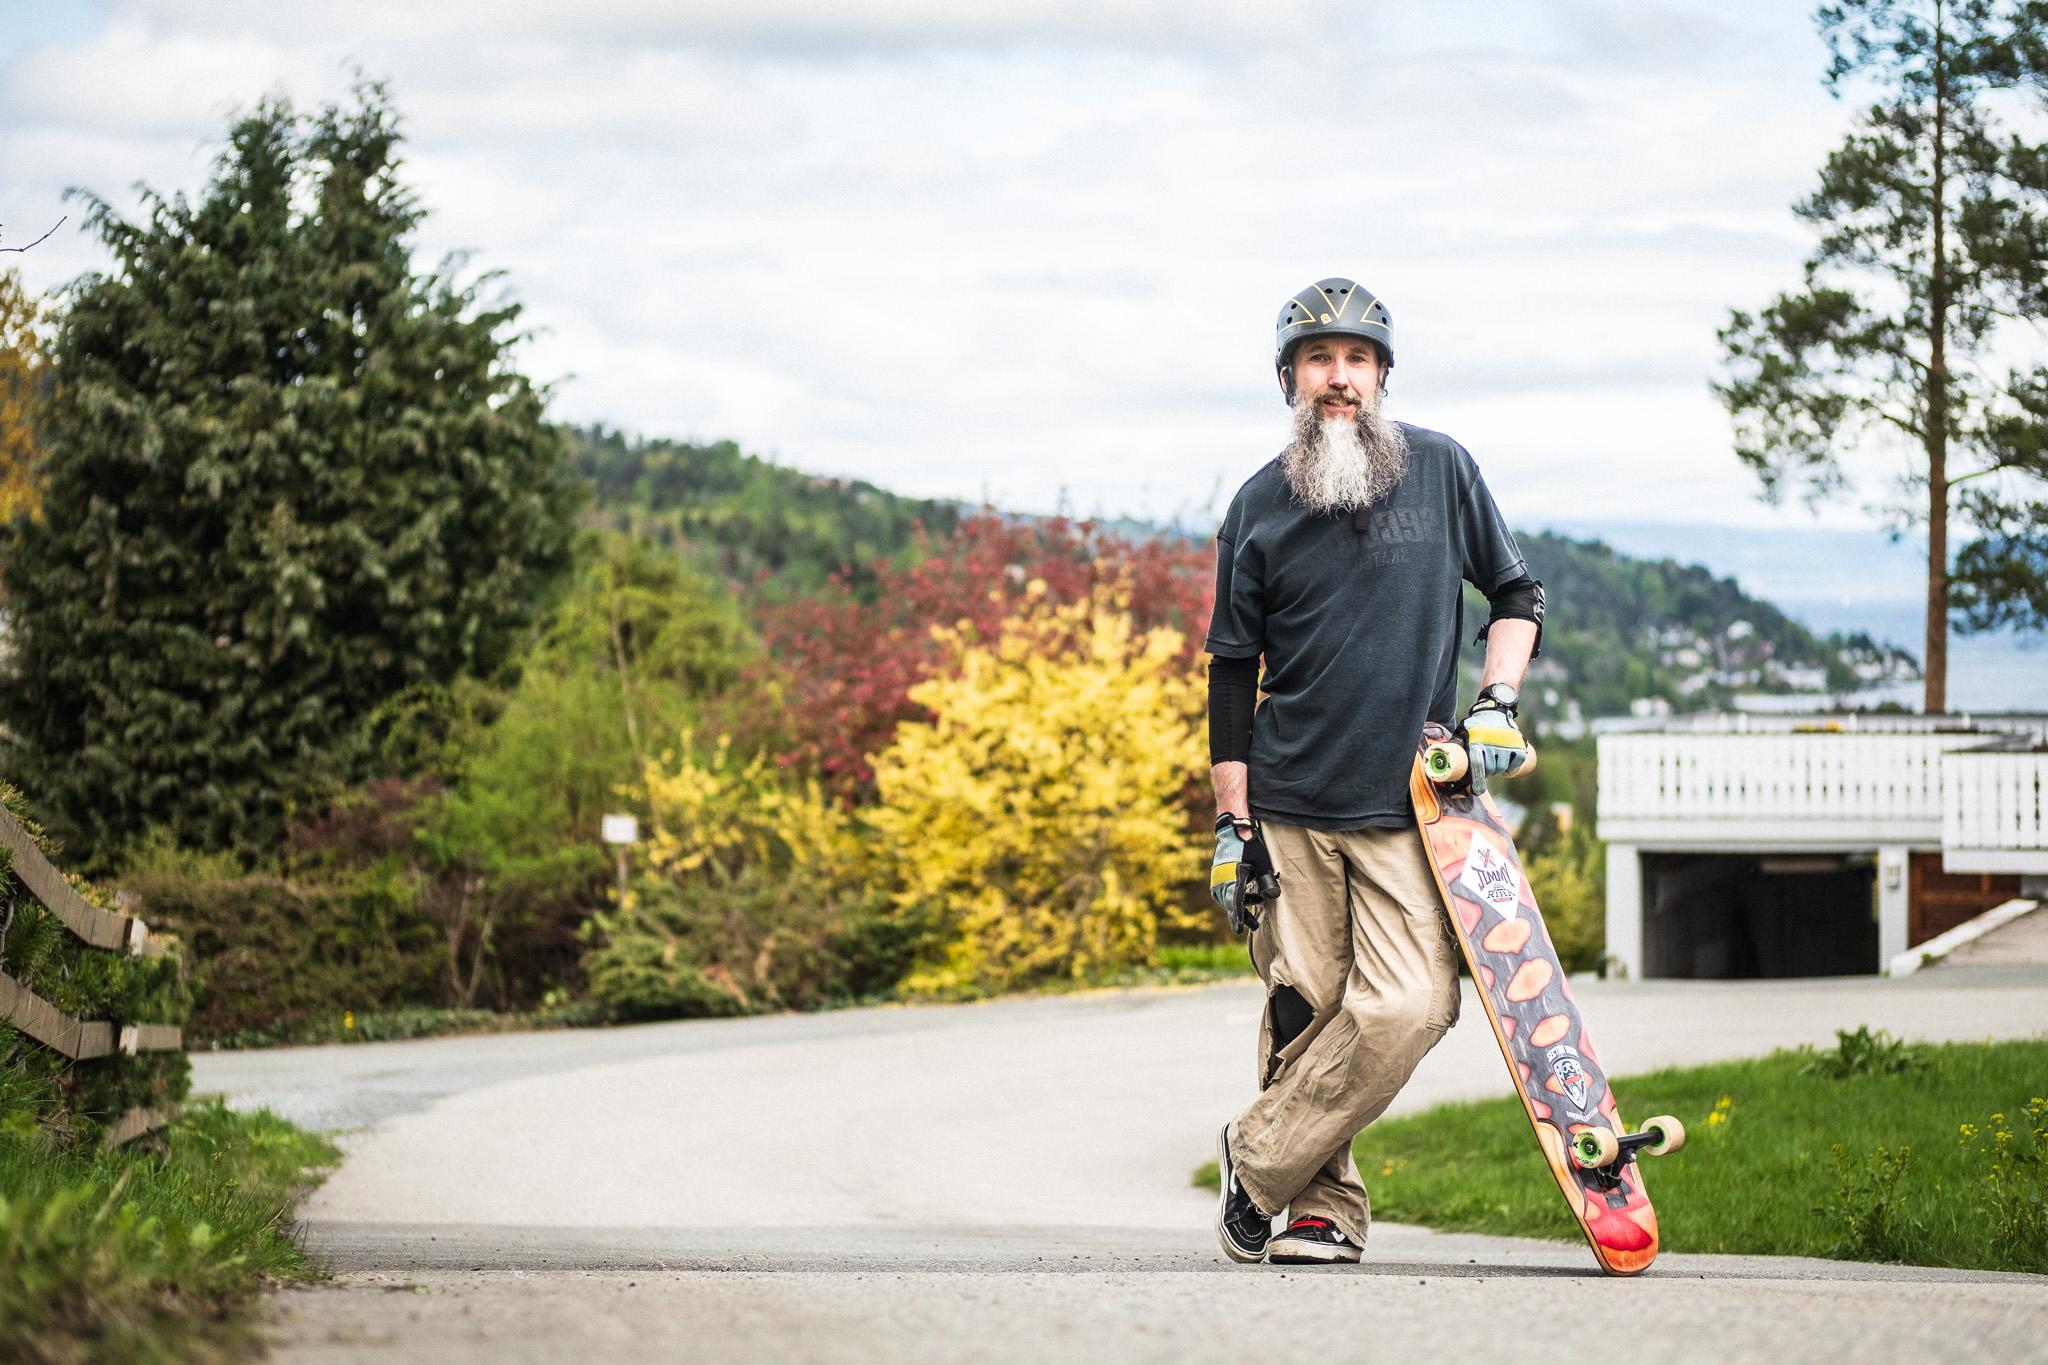 Cedric Cornell downhill skateboarding   © www.sebastiandahl.com Creative Commons BY-NC-SA Please ask before using.